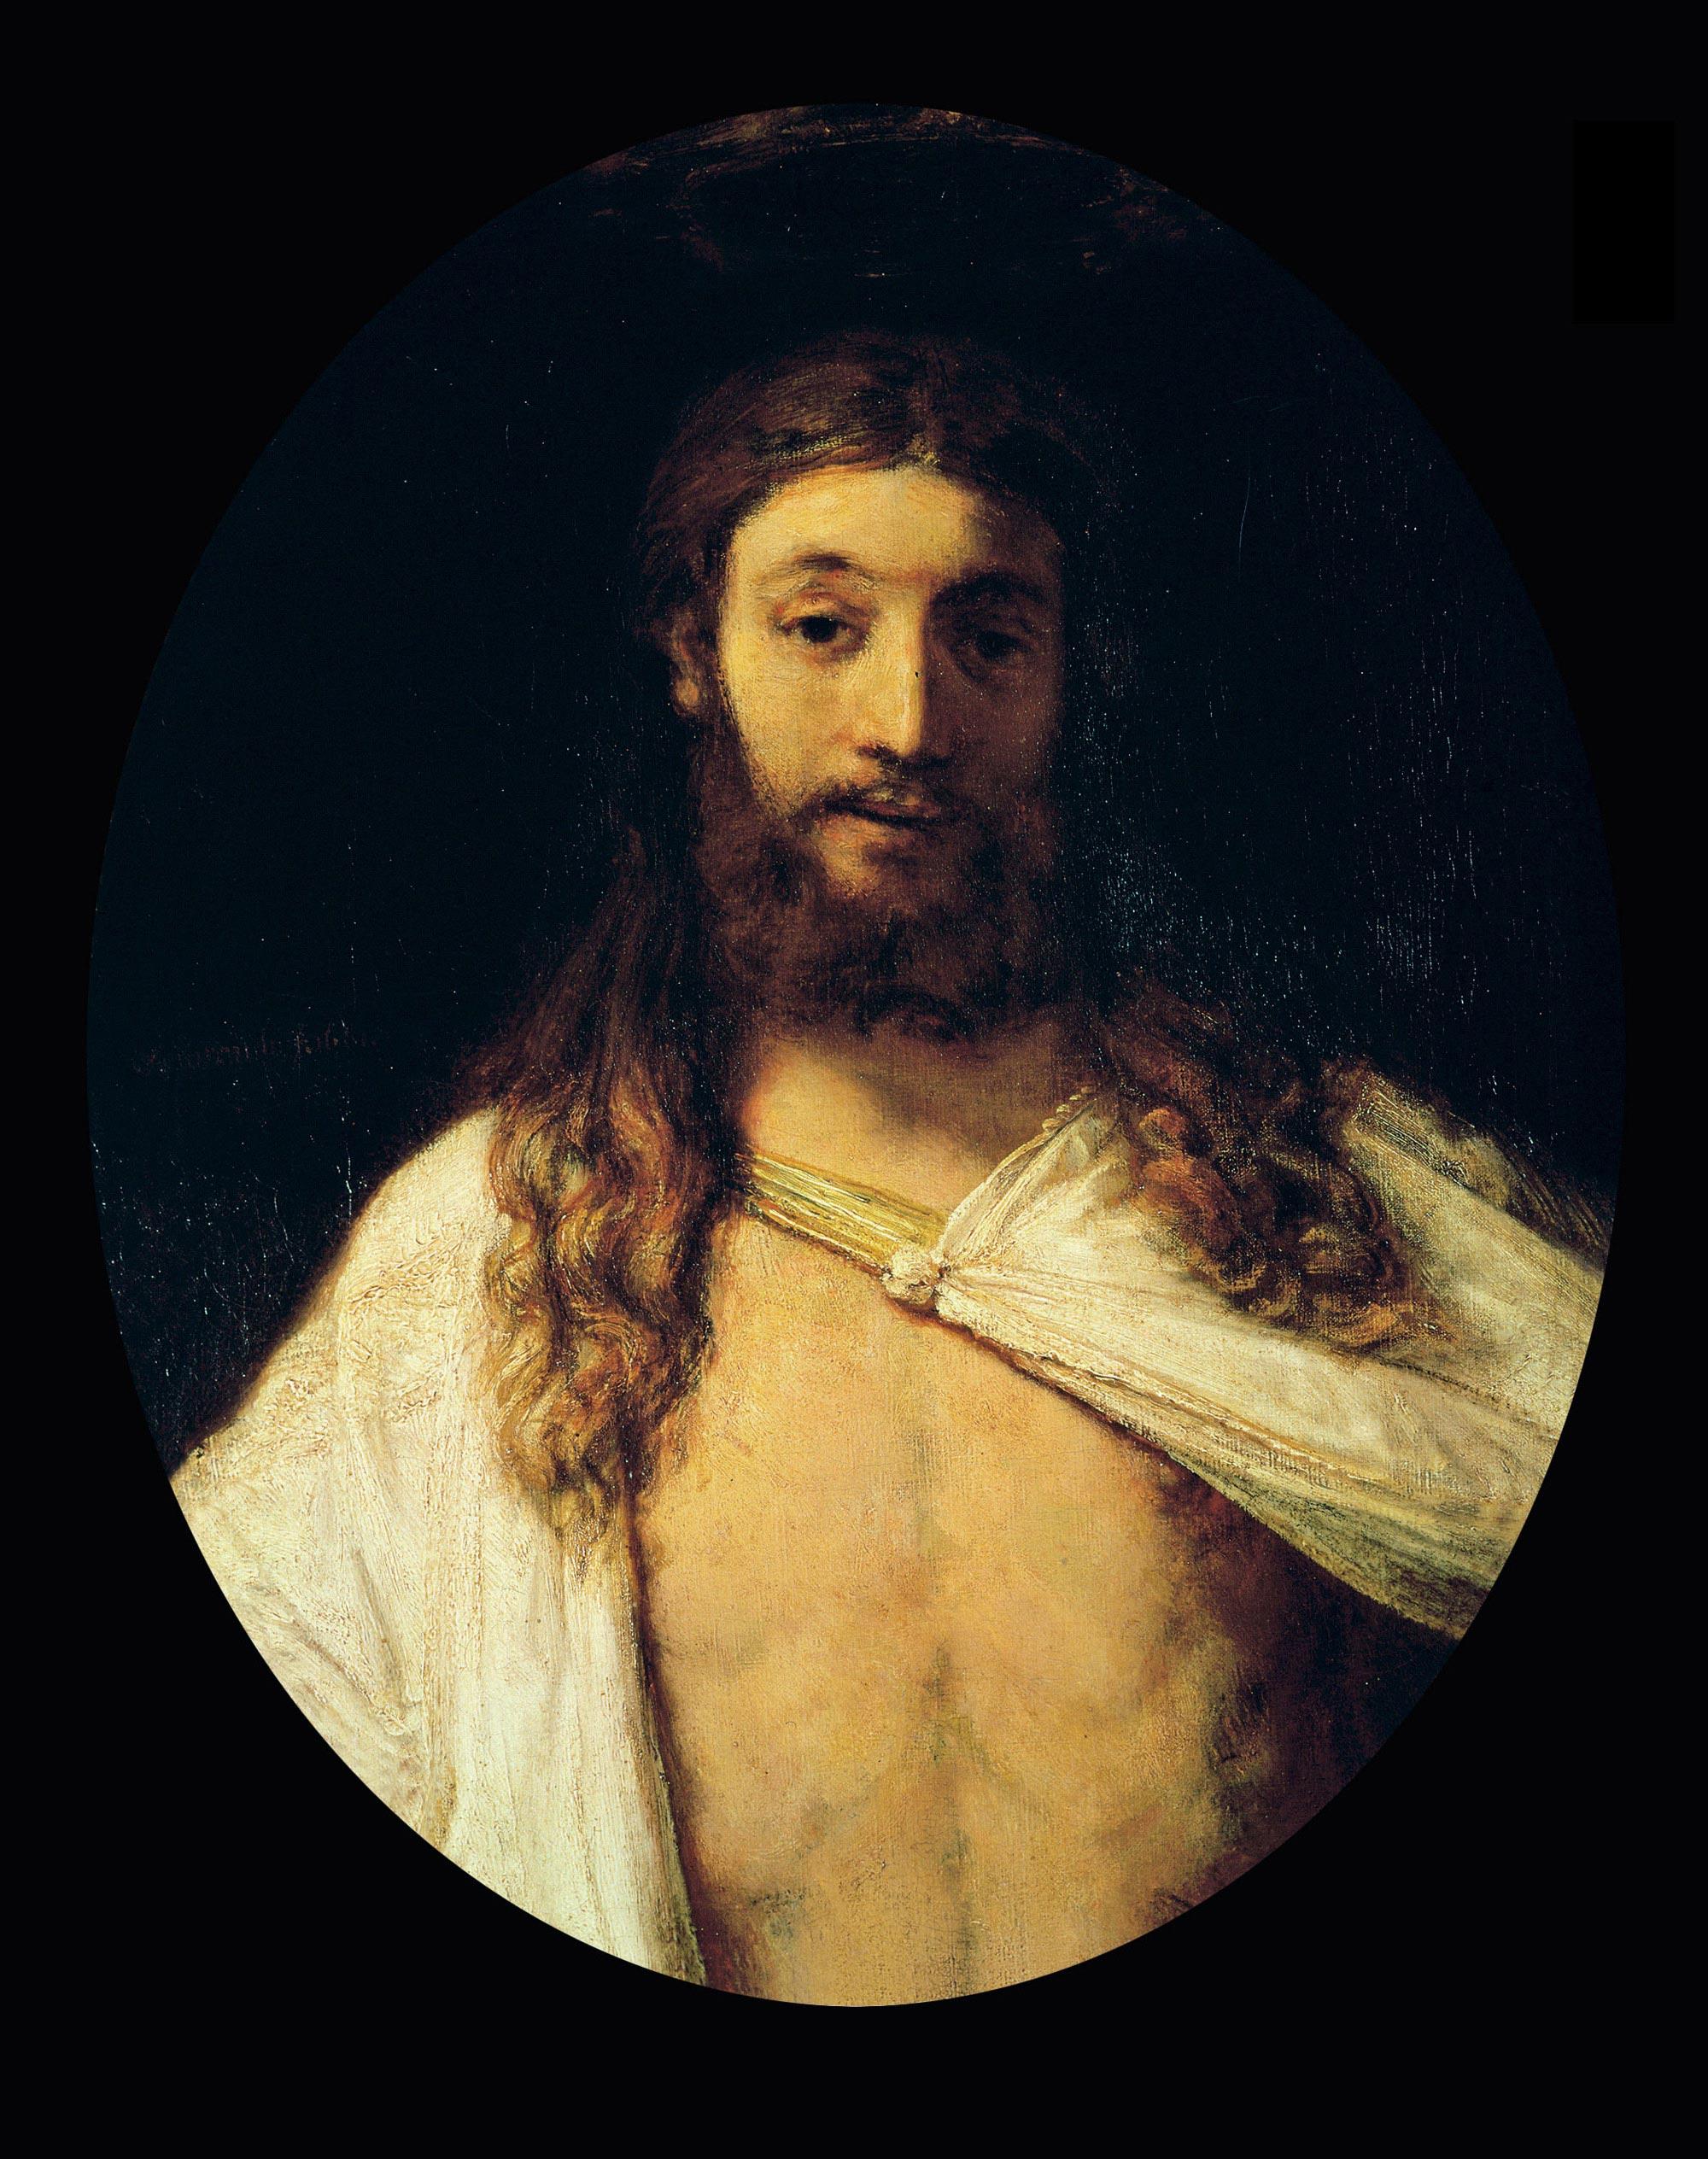 Rembrandt,  The Risen Chris t, oil on canvas, 1658, Alte Pinakothek, Munich